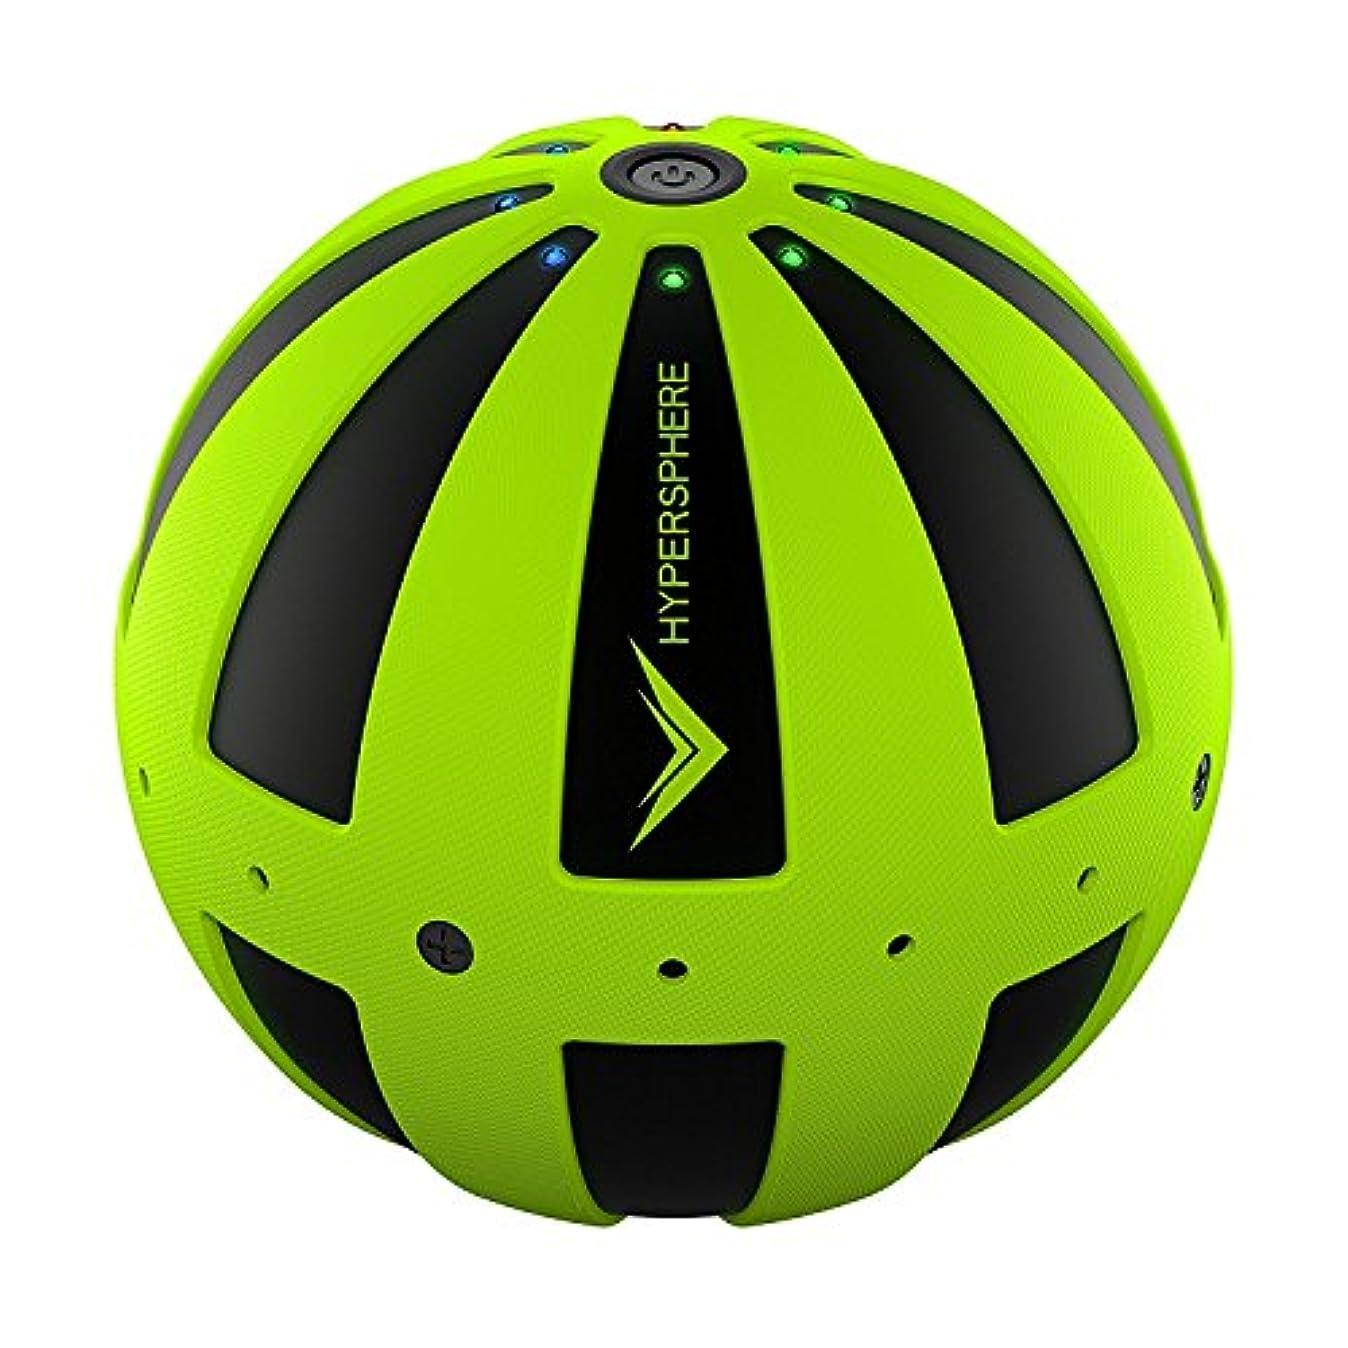 人種豊富民主主義Hyperice Hypersphere Vibrating Therapy Ball (並行輸入品)